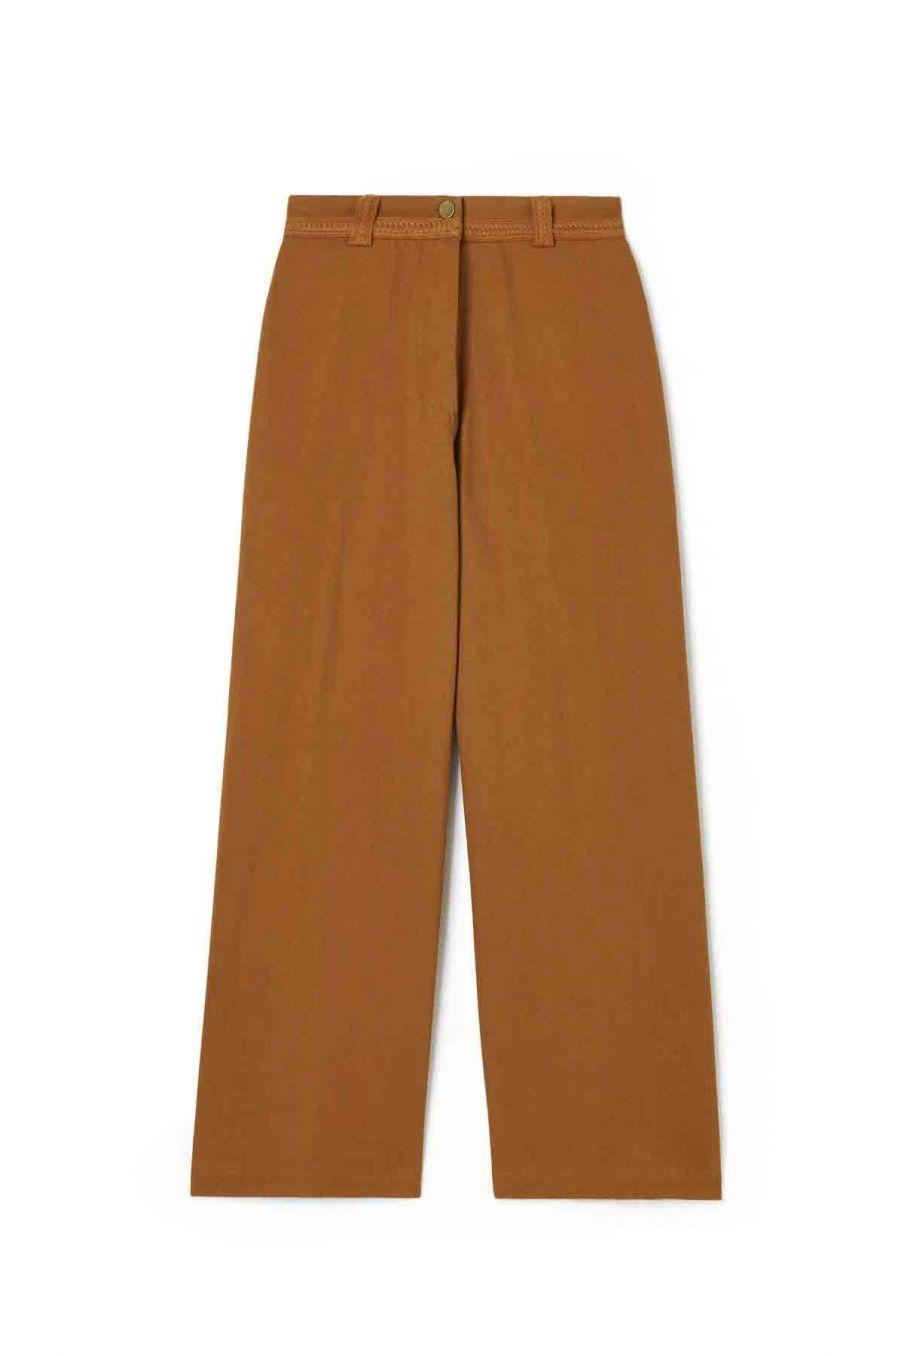 jeans femme suzie nuts - louise misha